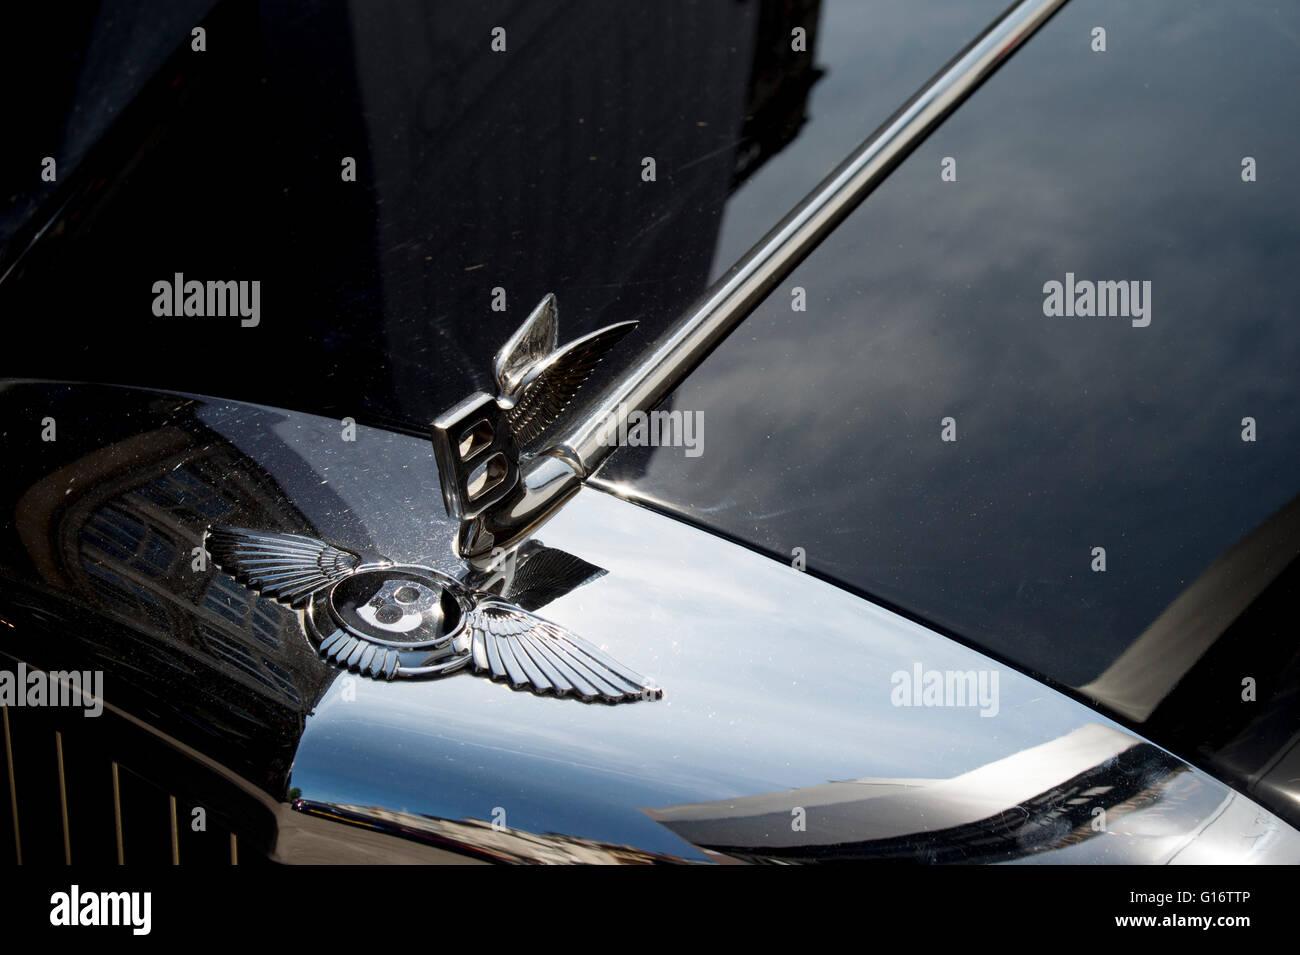 Radiator badge and flying B on classic Bentley car Stock Photo